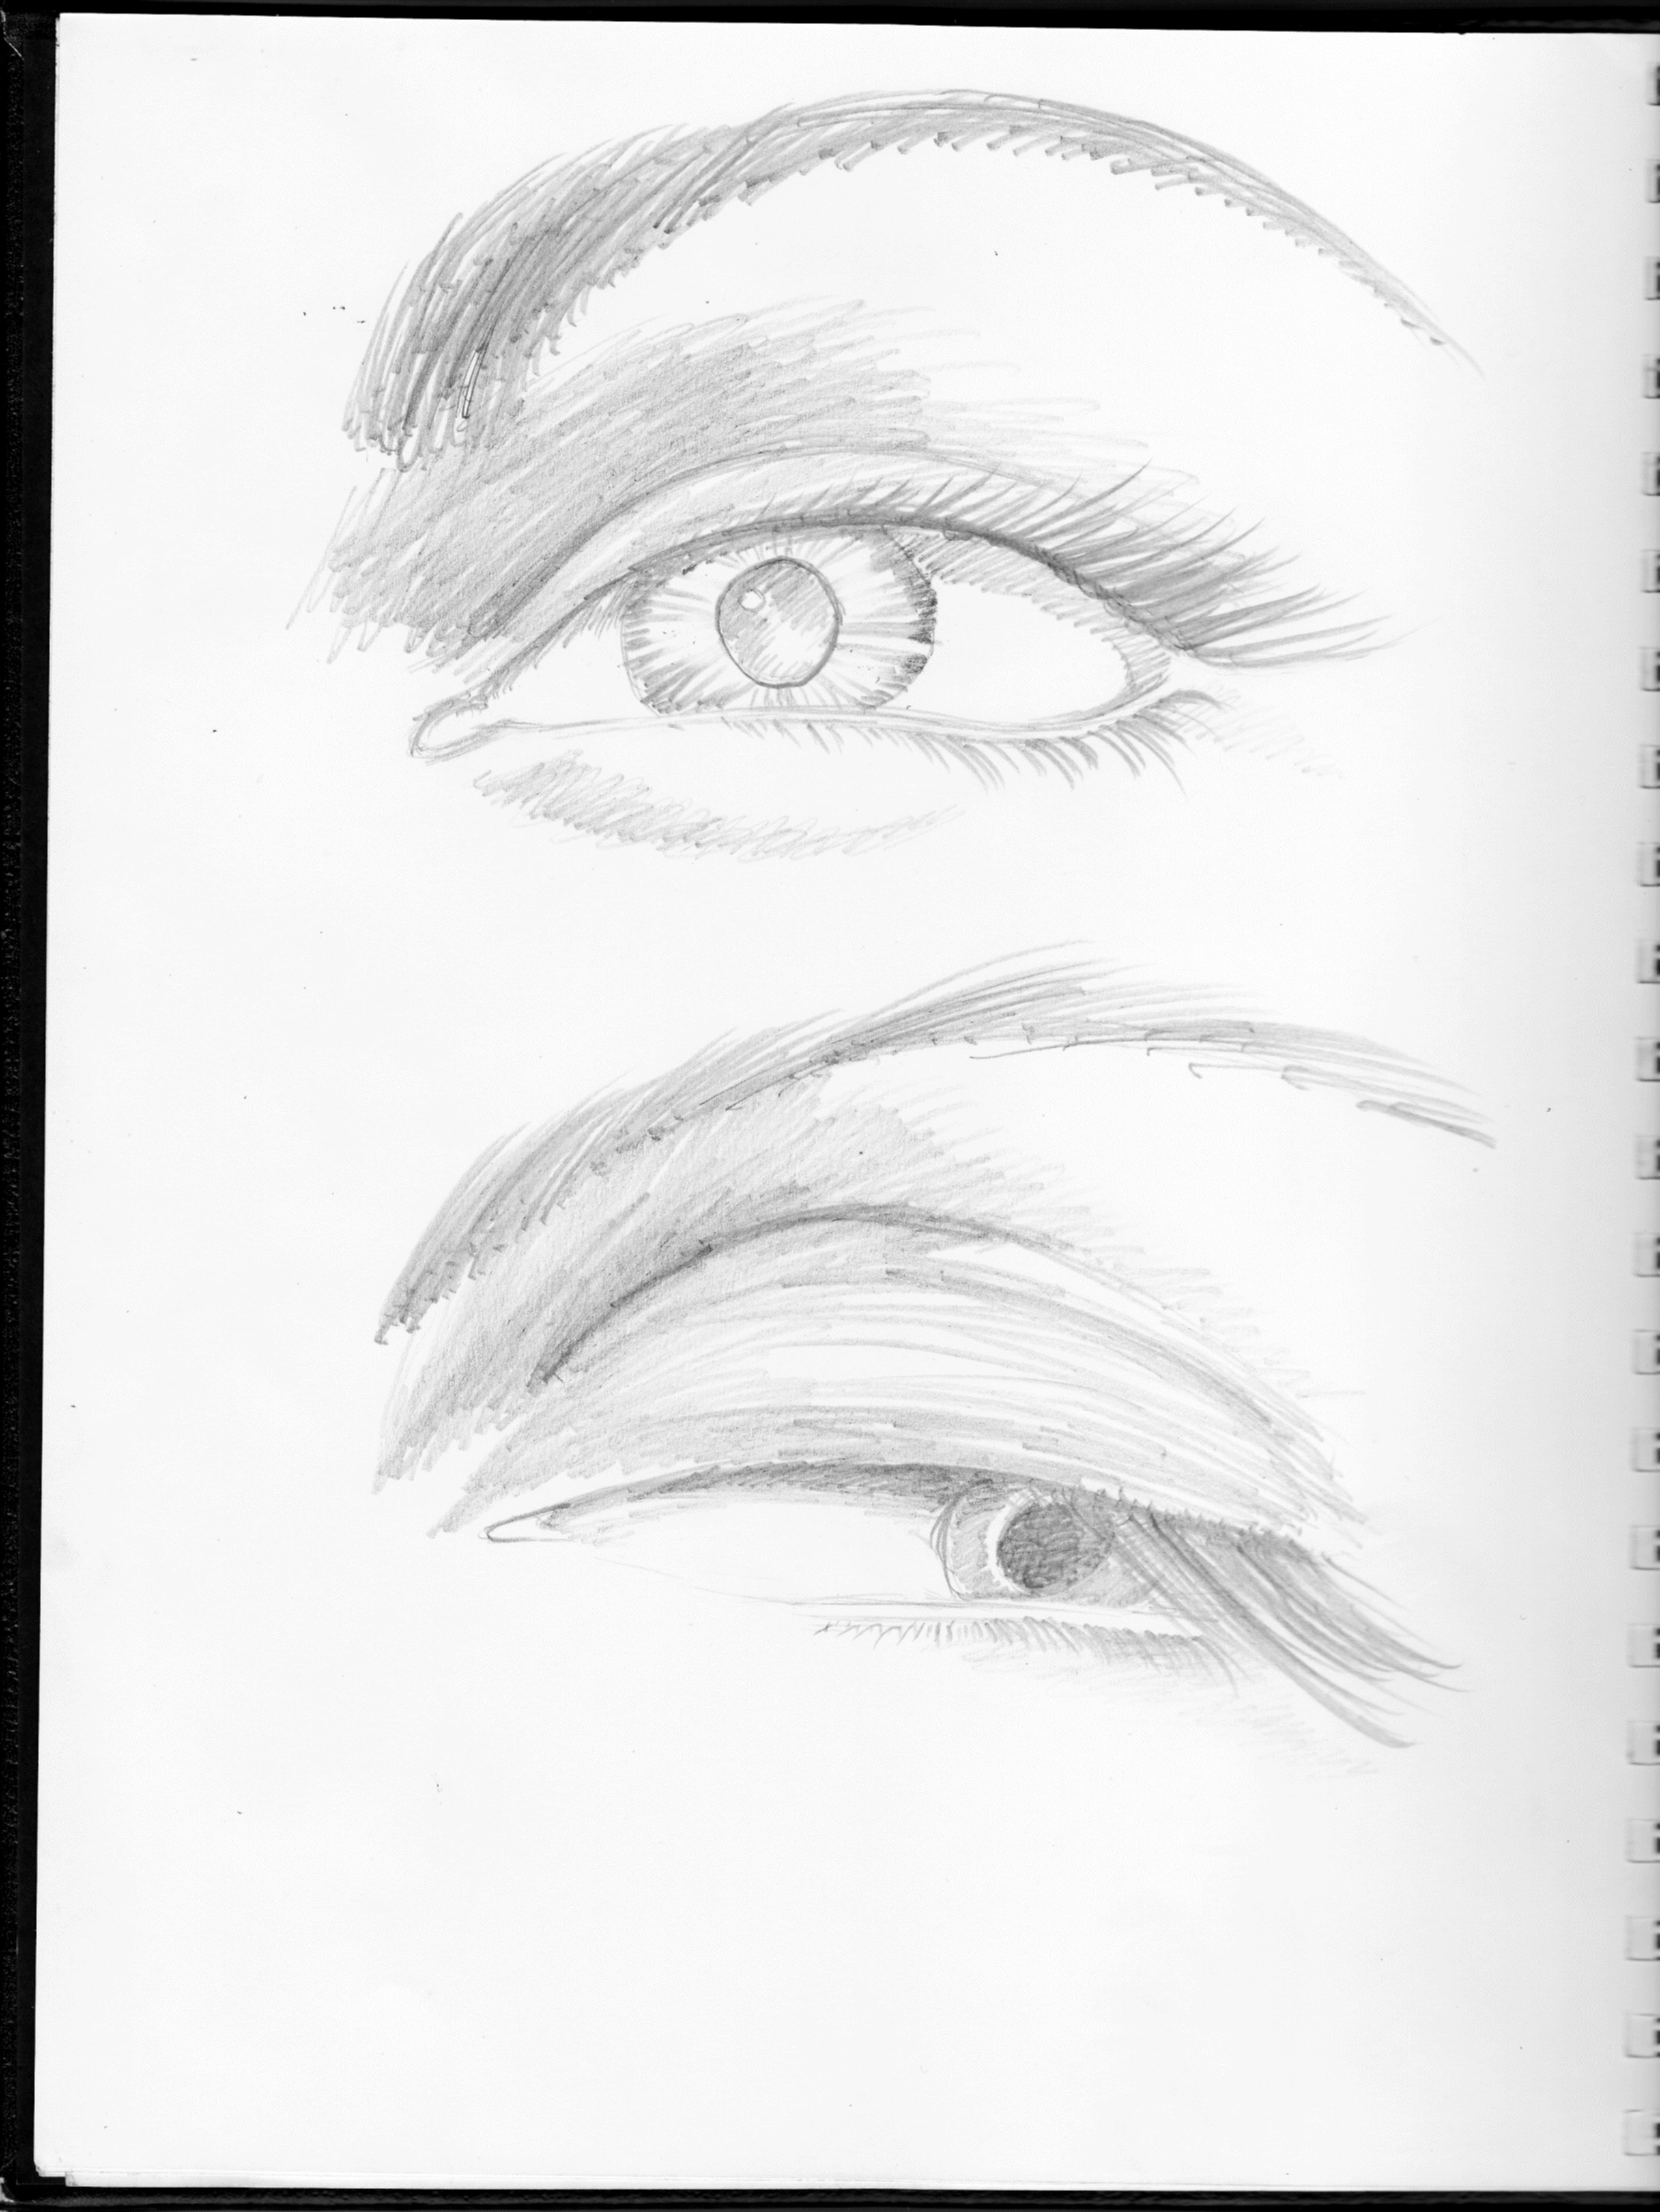 2548x3396 Uncategorized The Artist In Me Page 6